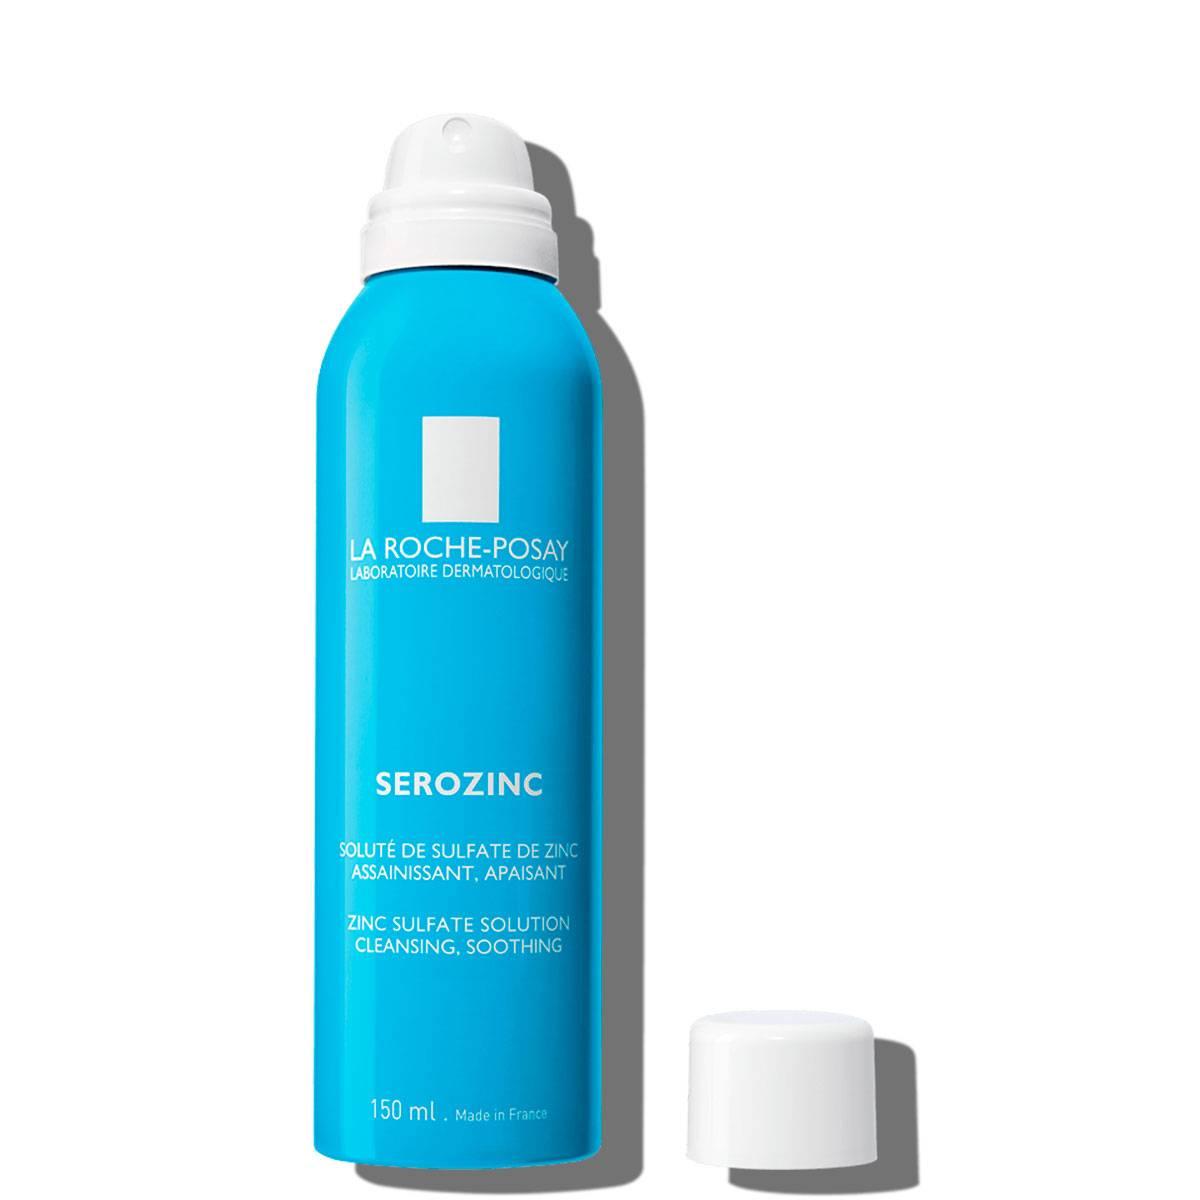 La Roche Posay ProductPage Serozinc Spray Zinc 150ml 3433422406728 Ope